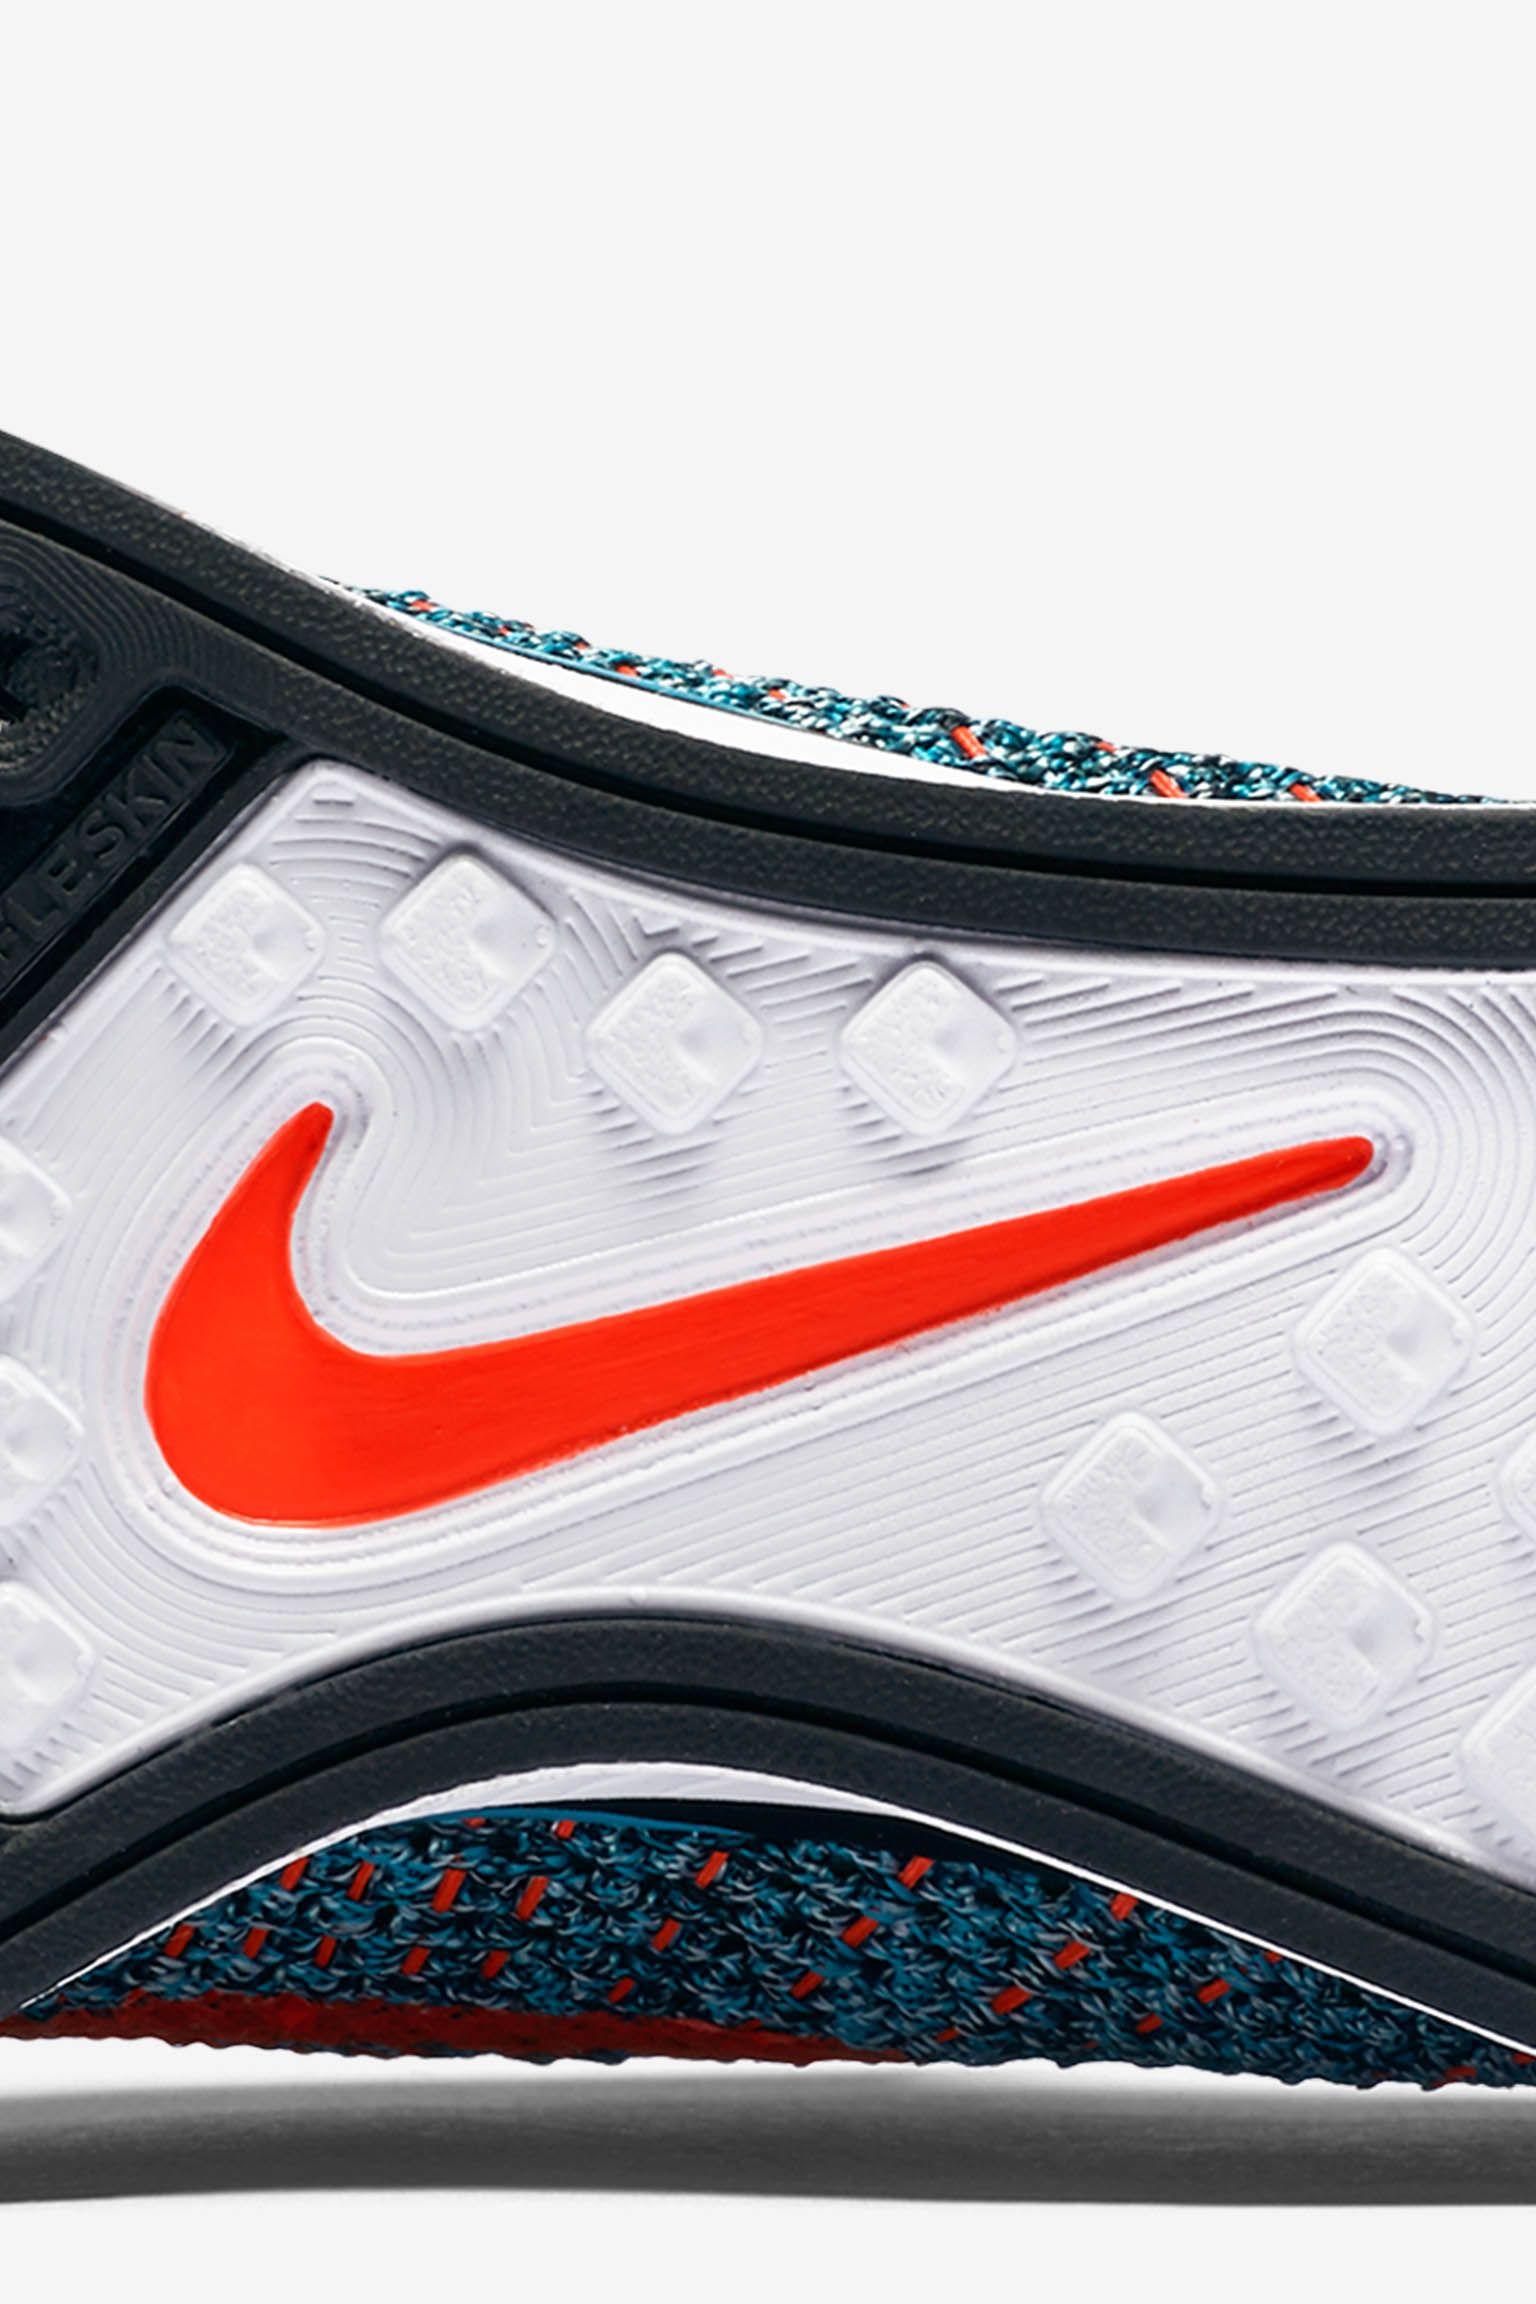 Nike Flyknit Racer 'Neo Turquoise' Release Date